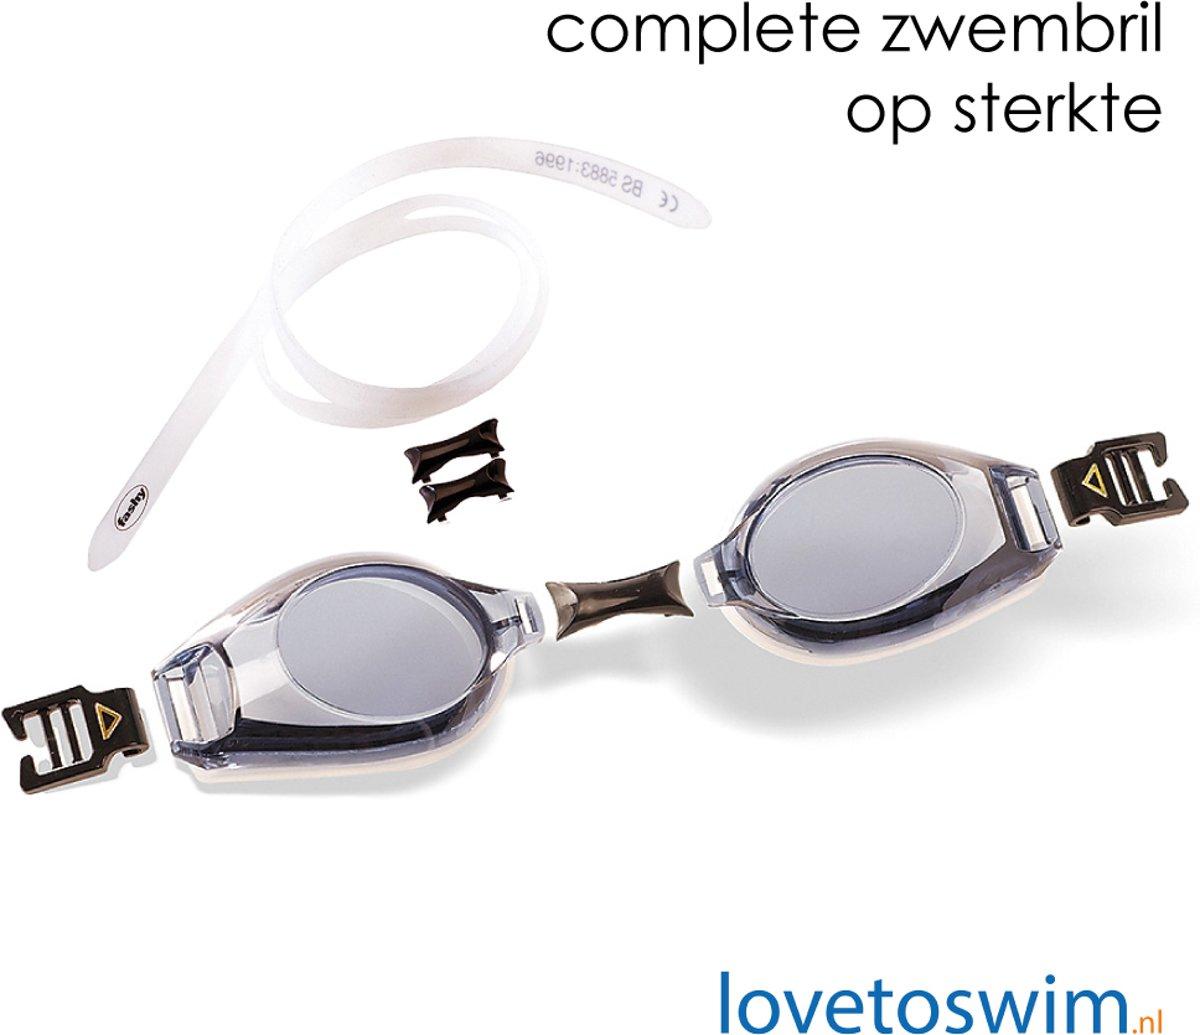 Zwembril op sterkte min -1.5 kopen